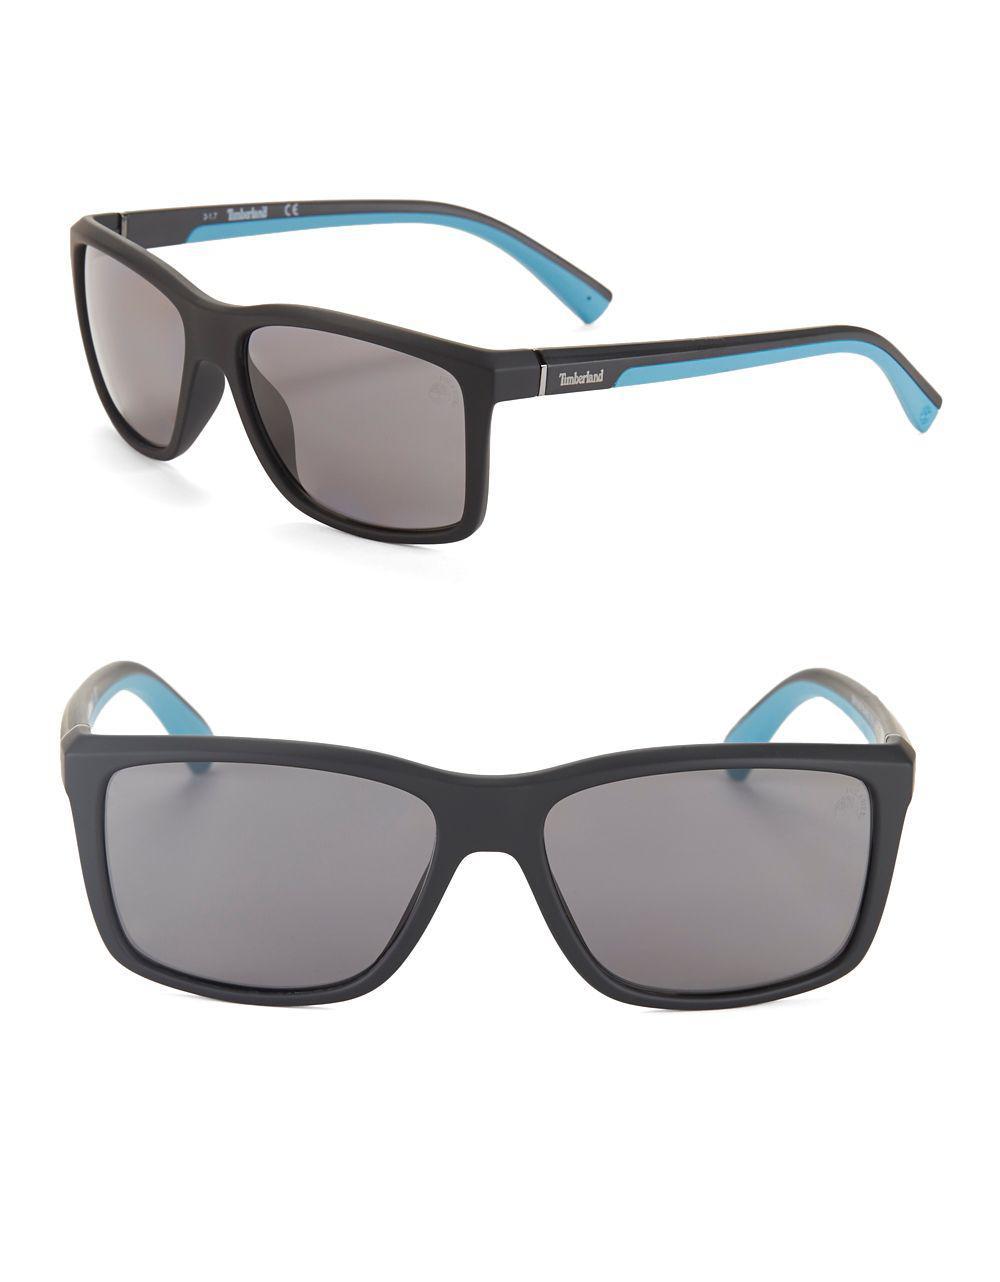 021c1bc3c28 Timberland - Black Marcolini Longarone 57mm Soft Square Sunglasses for Men  - Lyst. View fullscreen